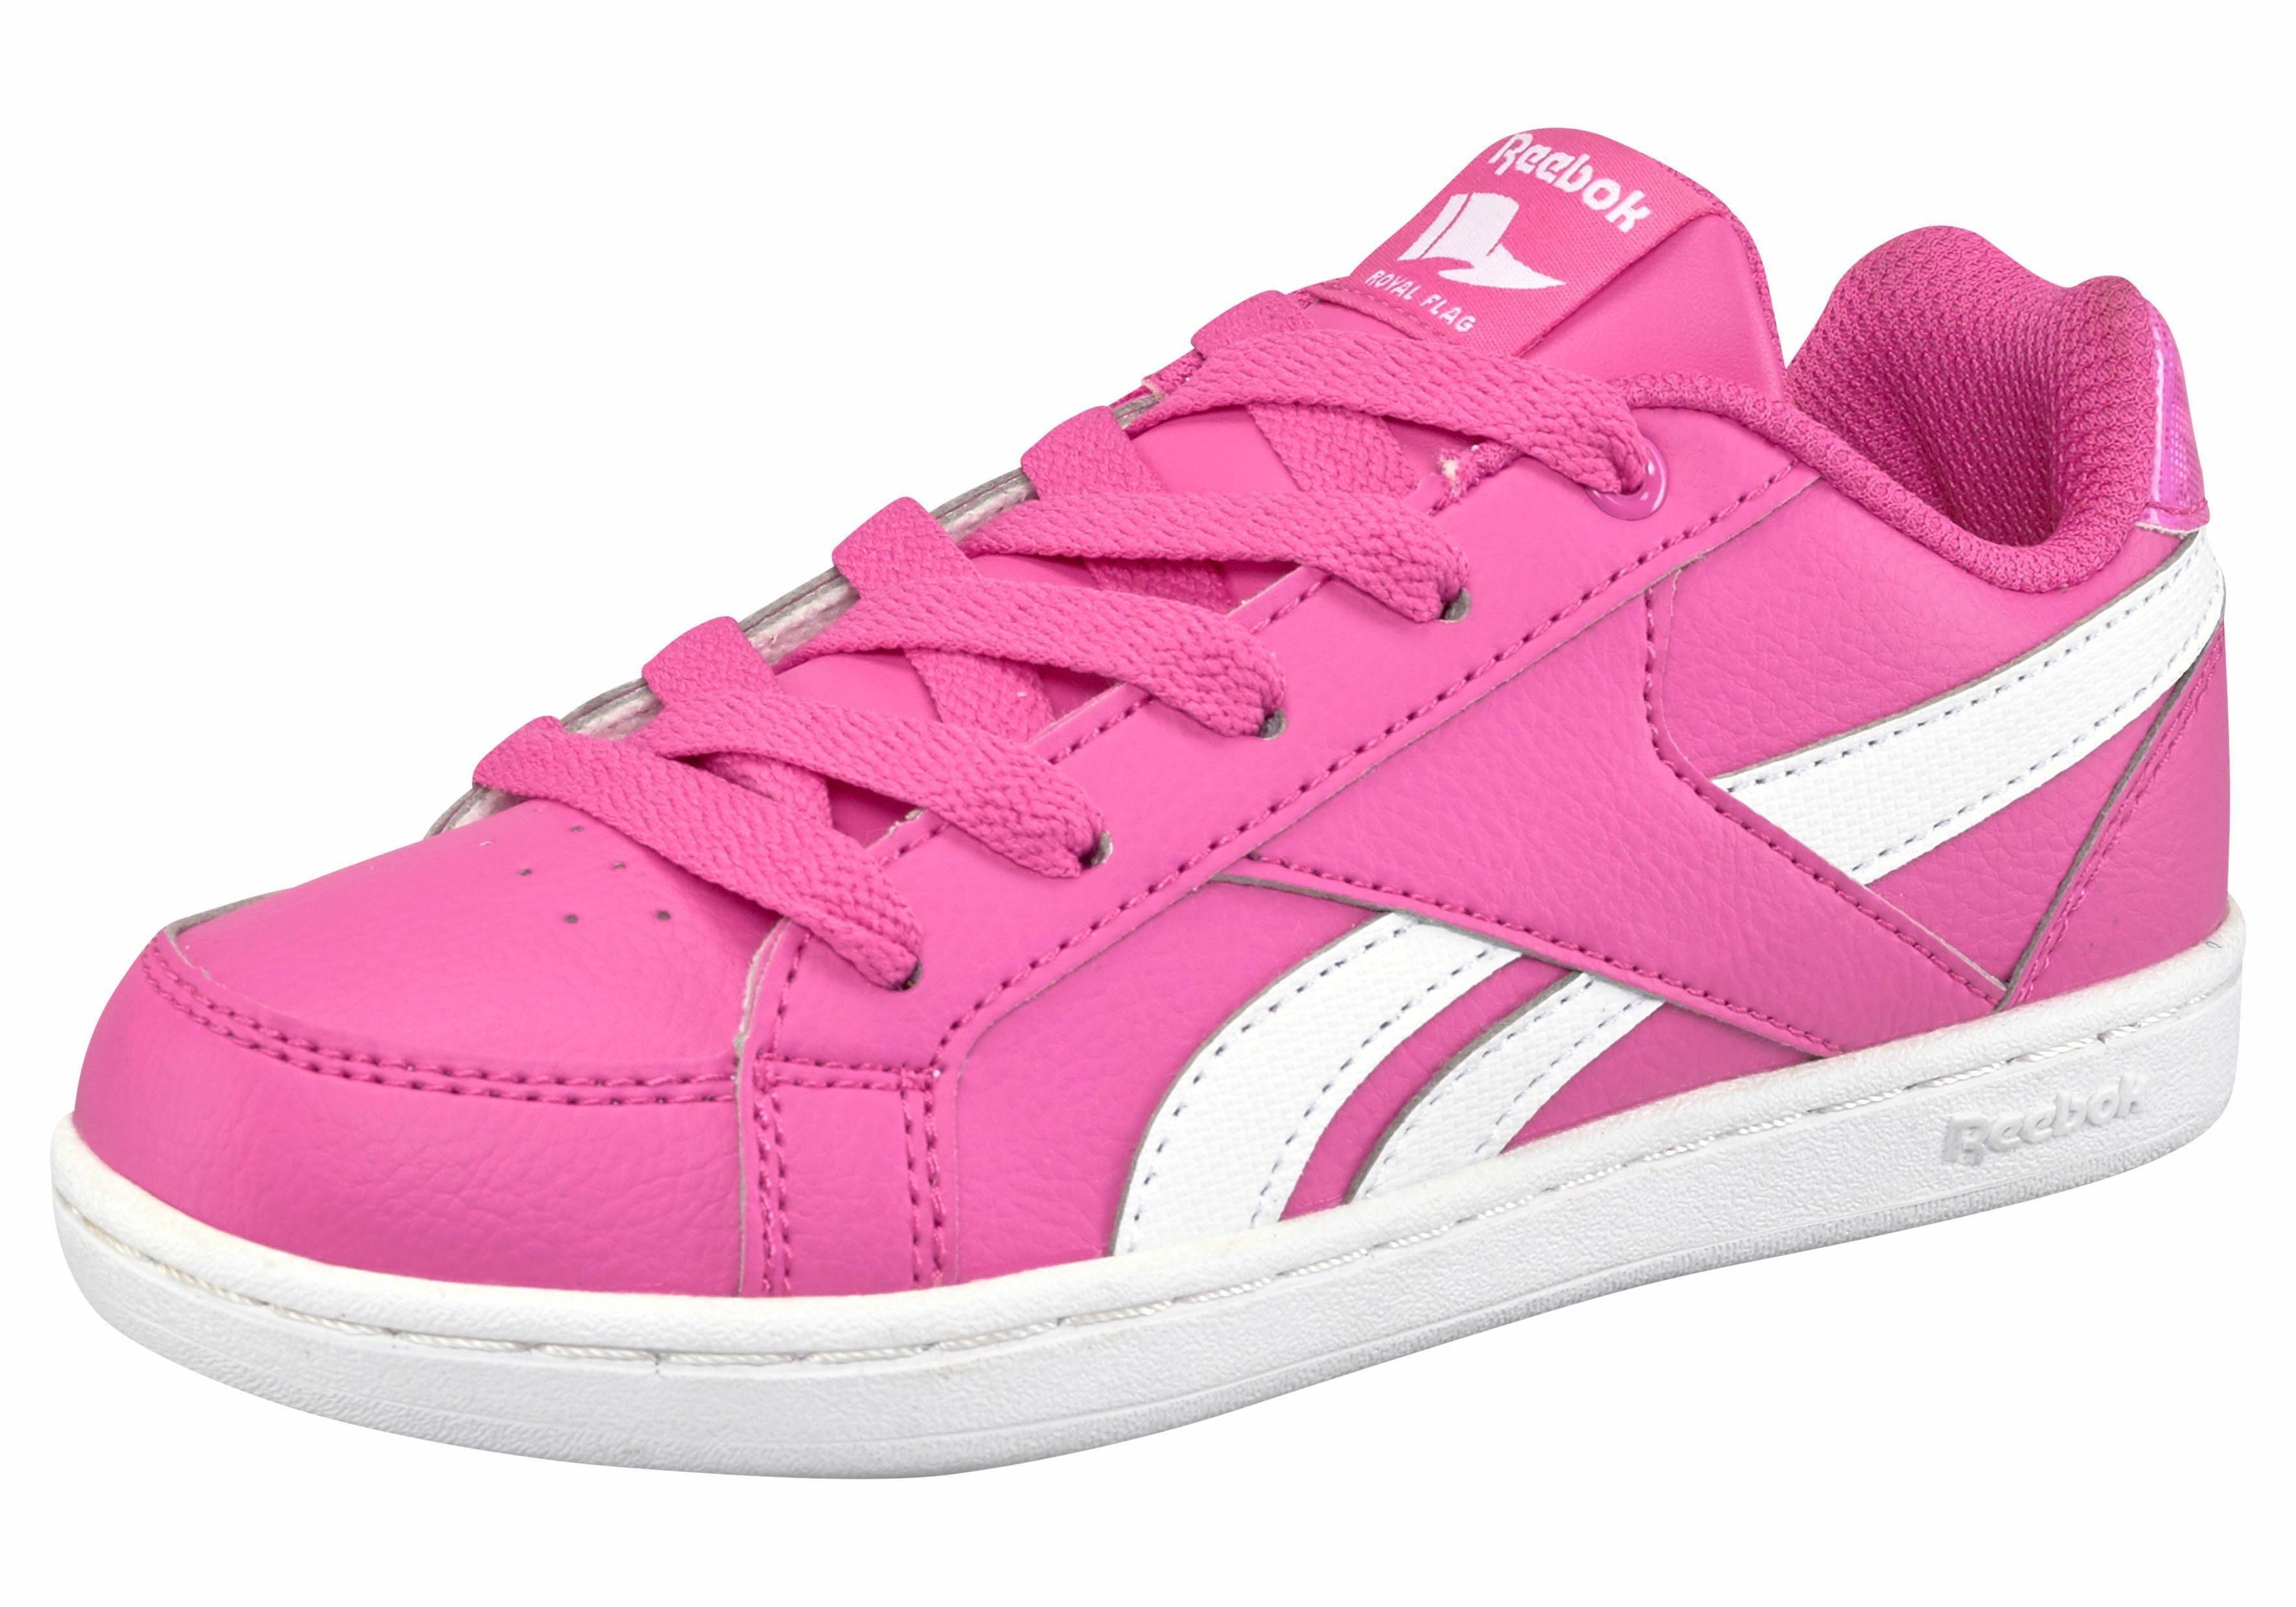 Reebok ROYAL PRIME J Sneaker online kaufen  pink-weiß